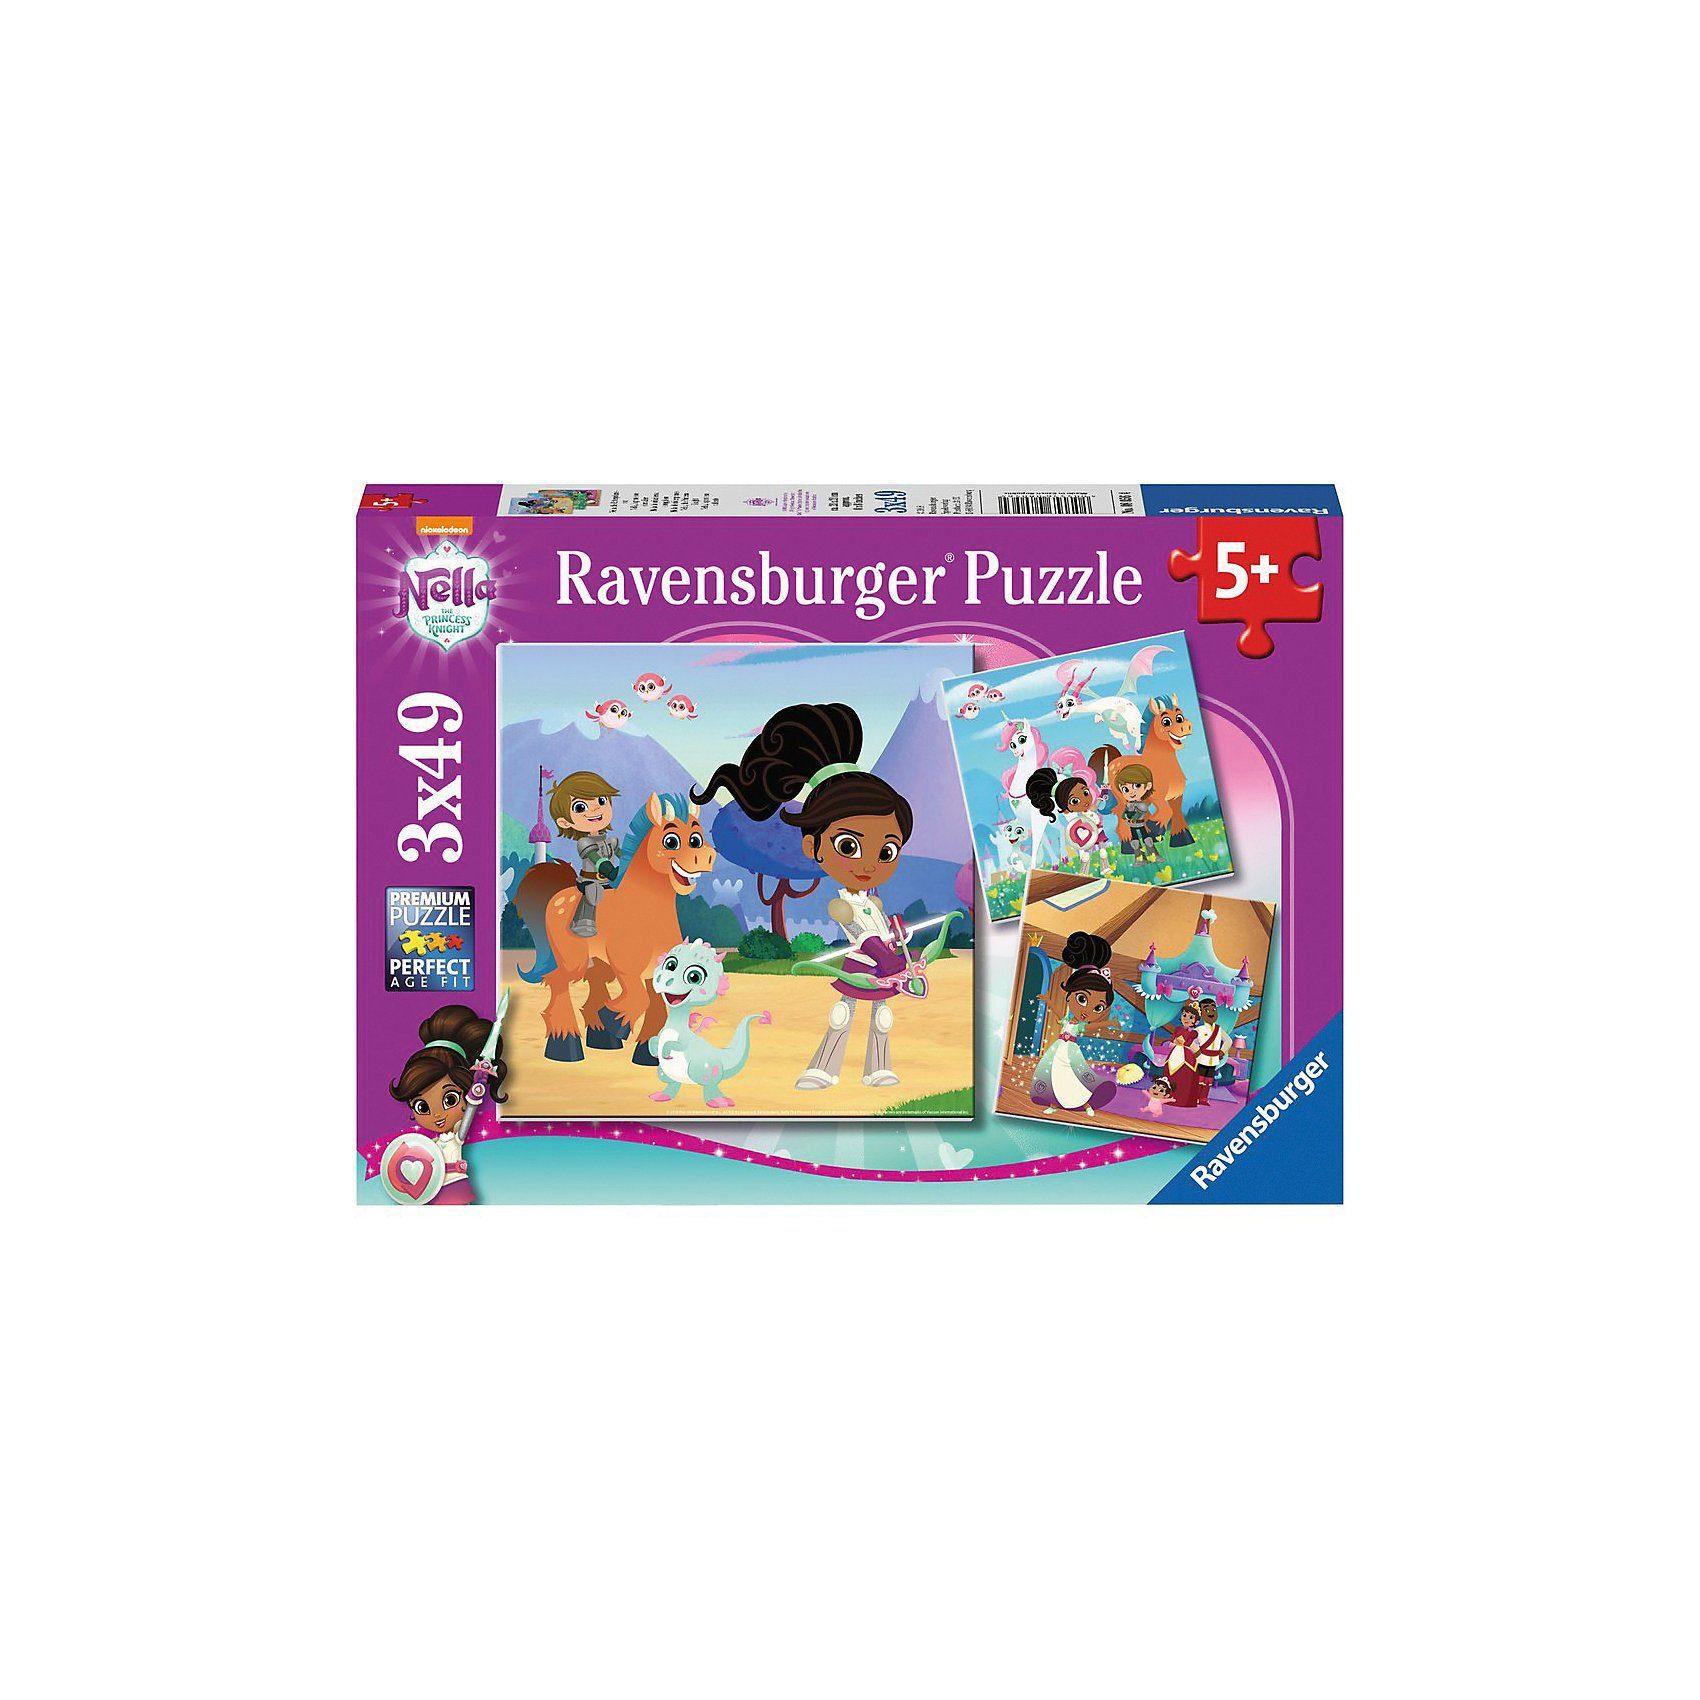 Ravensburger 3er Set Puzzle, je 49 Teile, 21x21 cm, Nella, die Ritterprin